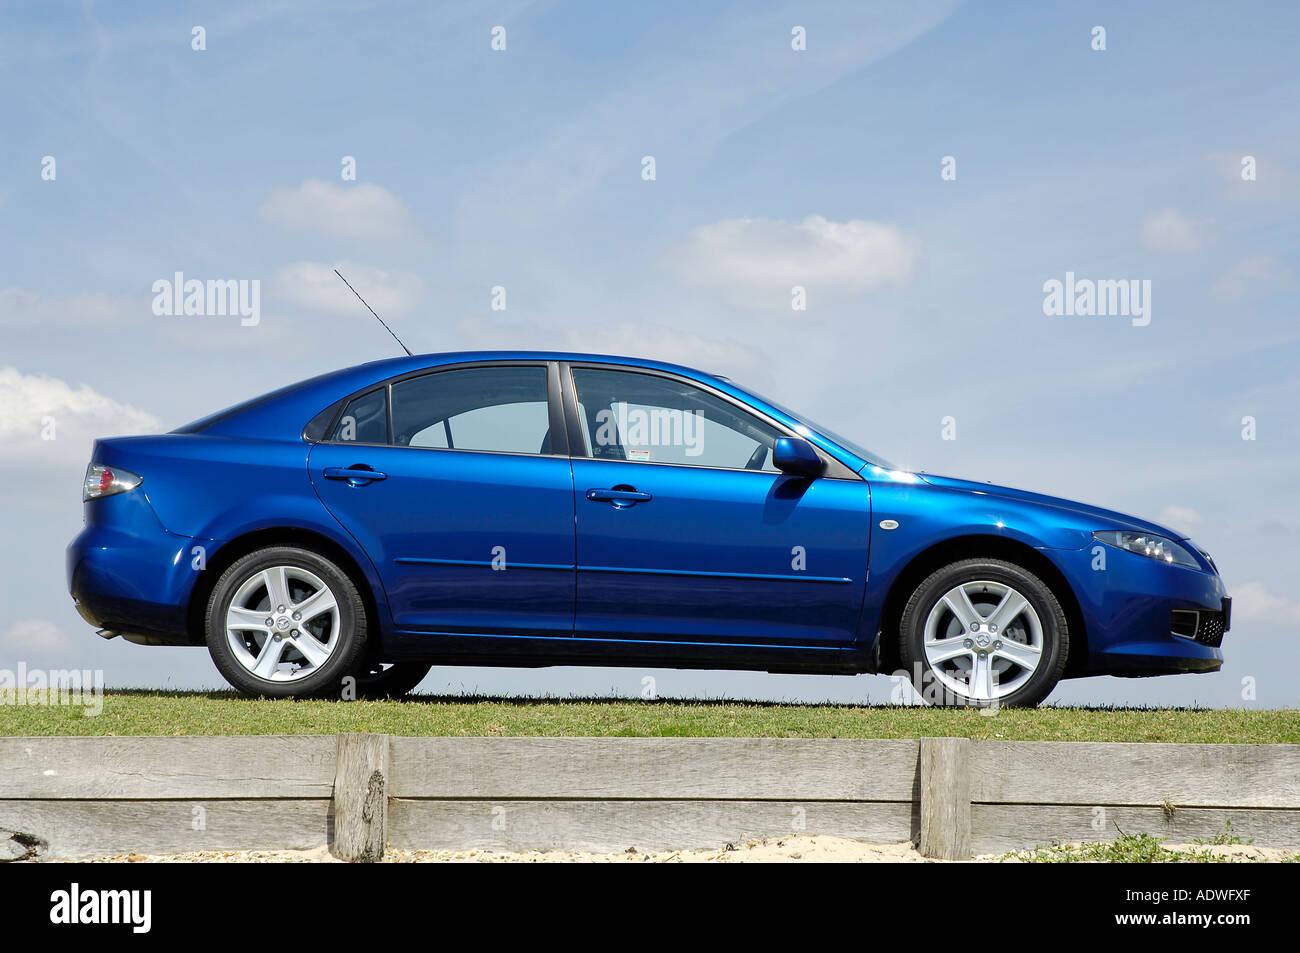 2005 mazda 6 2 0 ts stock photo 7714030 alamy rh alamy com 2005 Mazda 6 Hatchback 2005 Mazda Protege